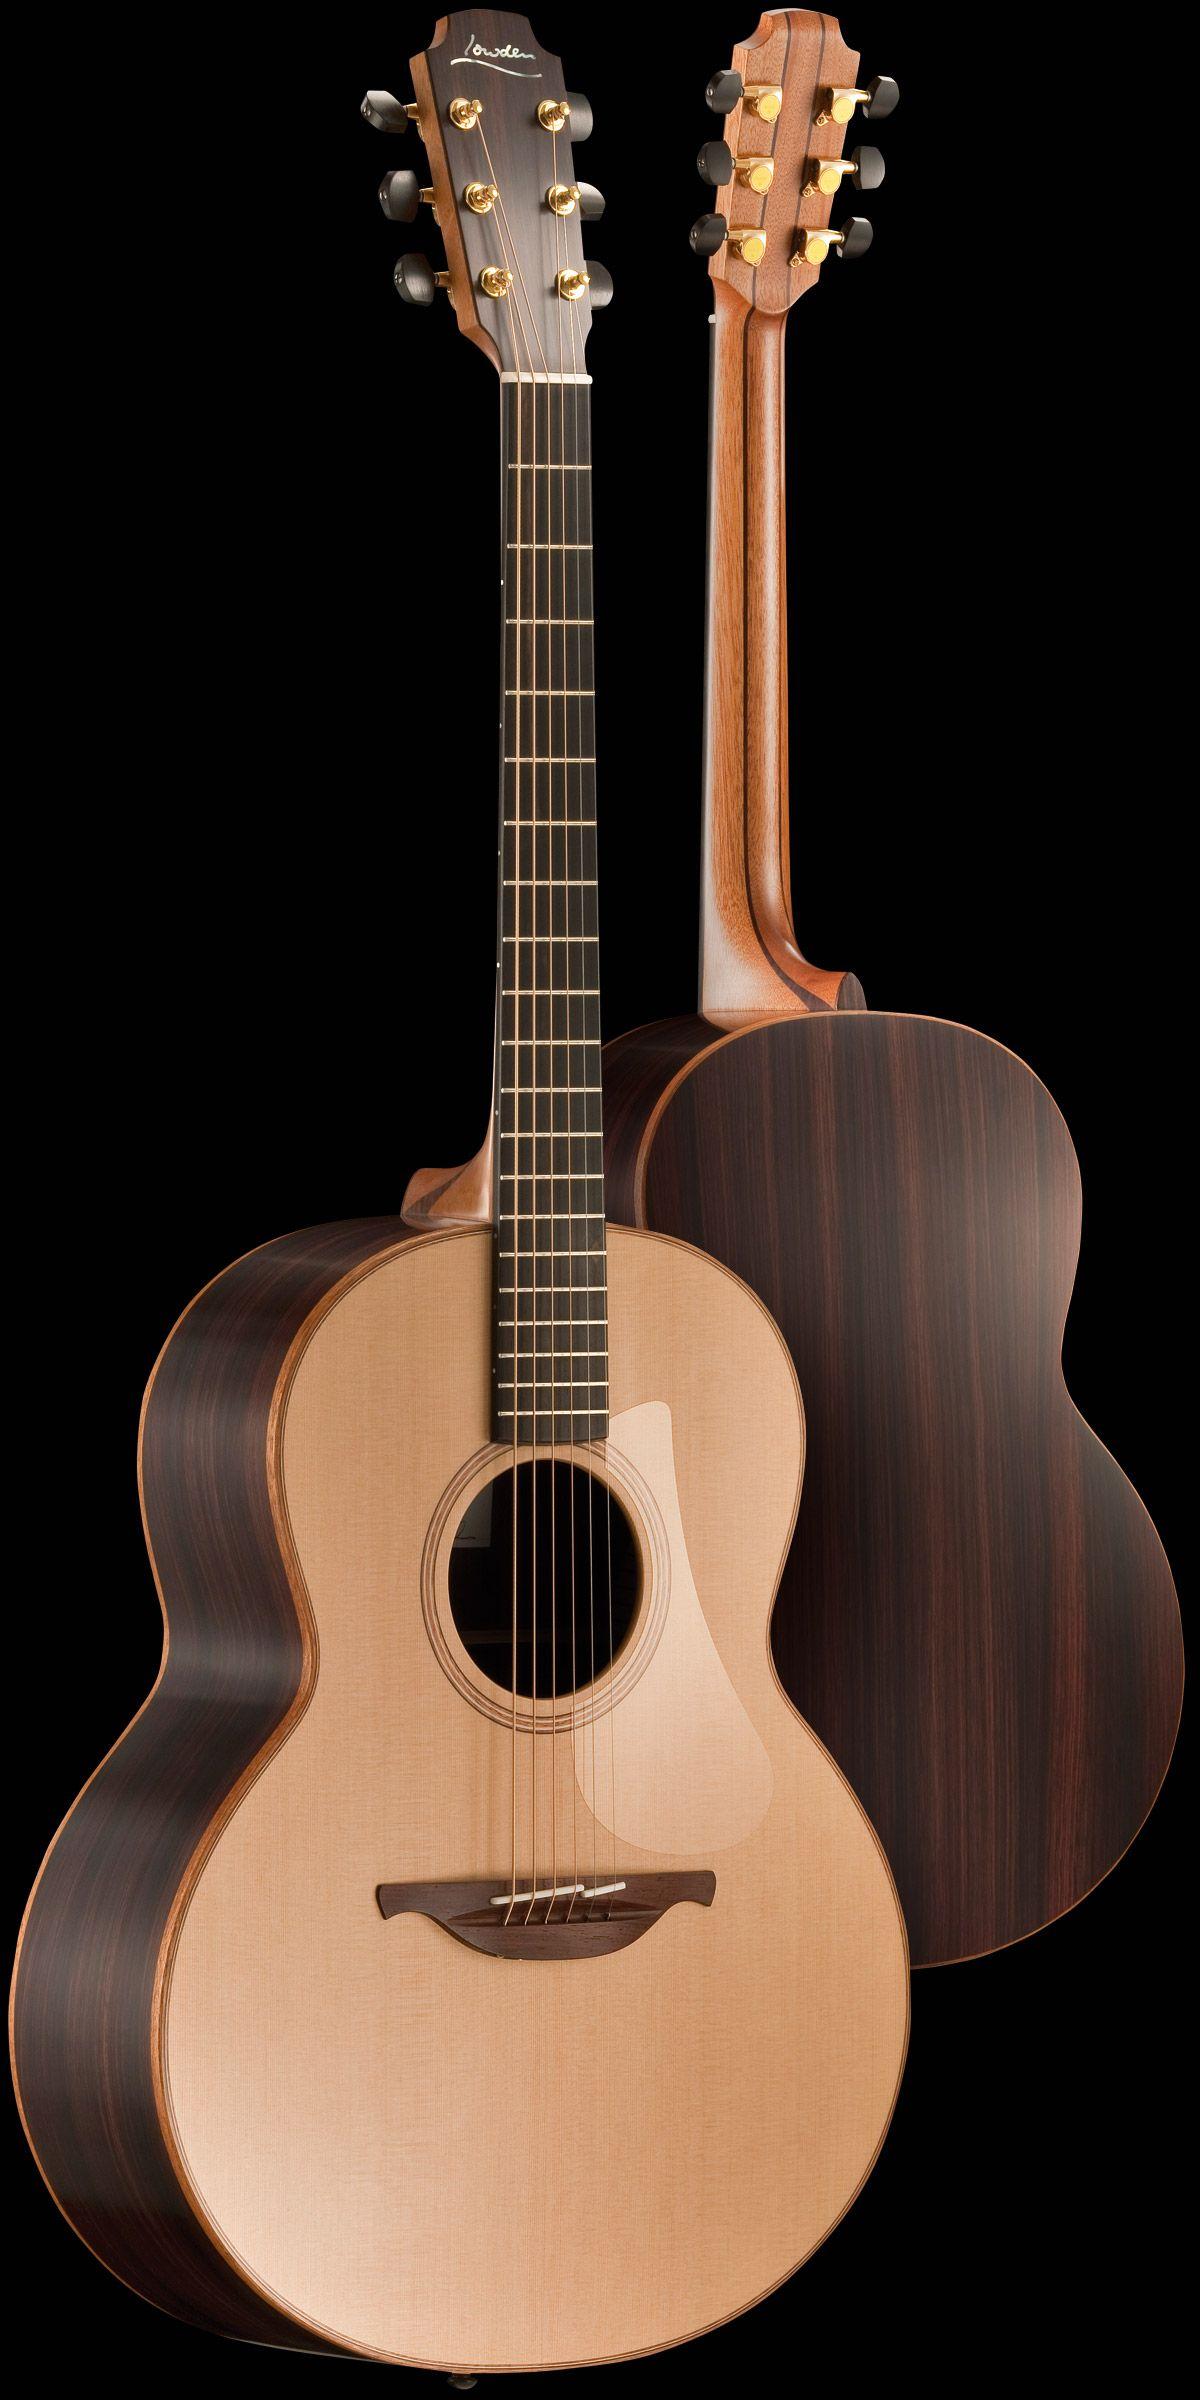 Original Series Lowden Guitars Handmade And Hand Built Acoustic Guitar Range From Downpatrick Ireland Guitar Acoustic Guitar Music Guitar